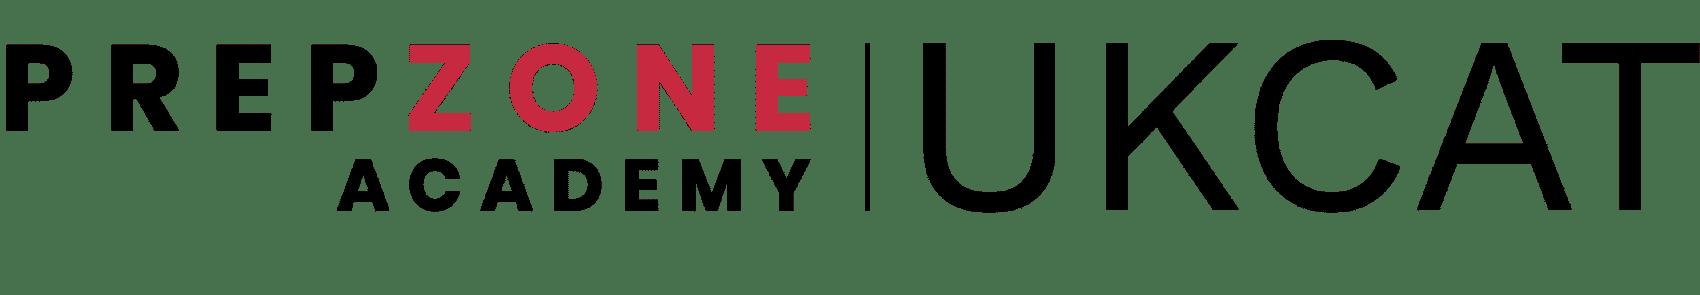 Prep Zone Academy | UCAT (UKCAT)